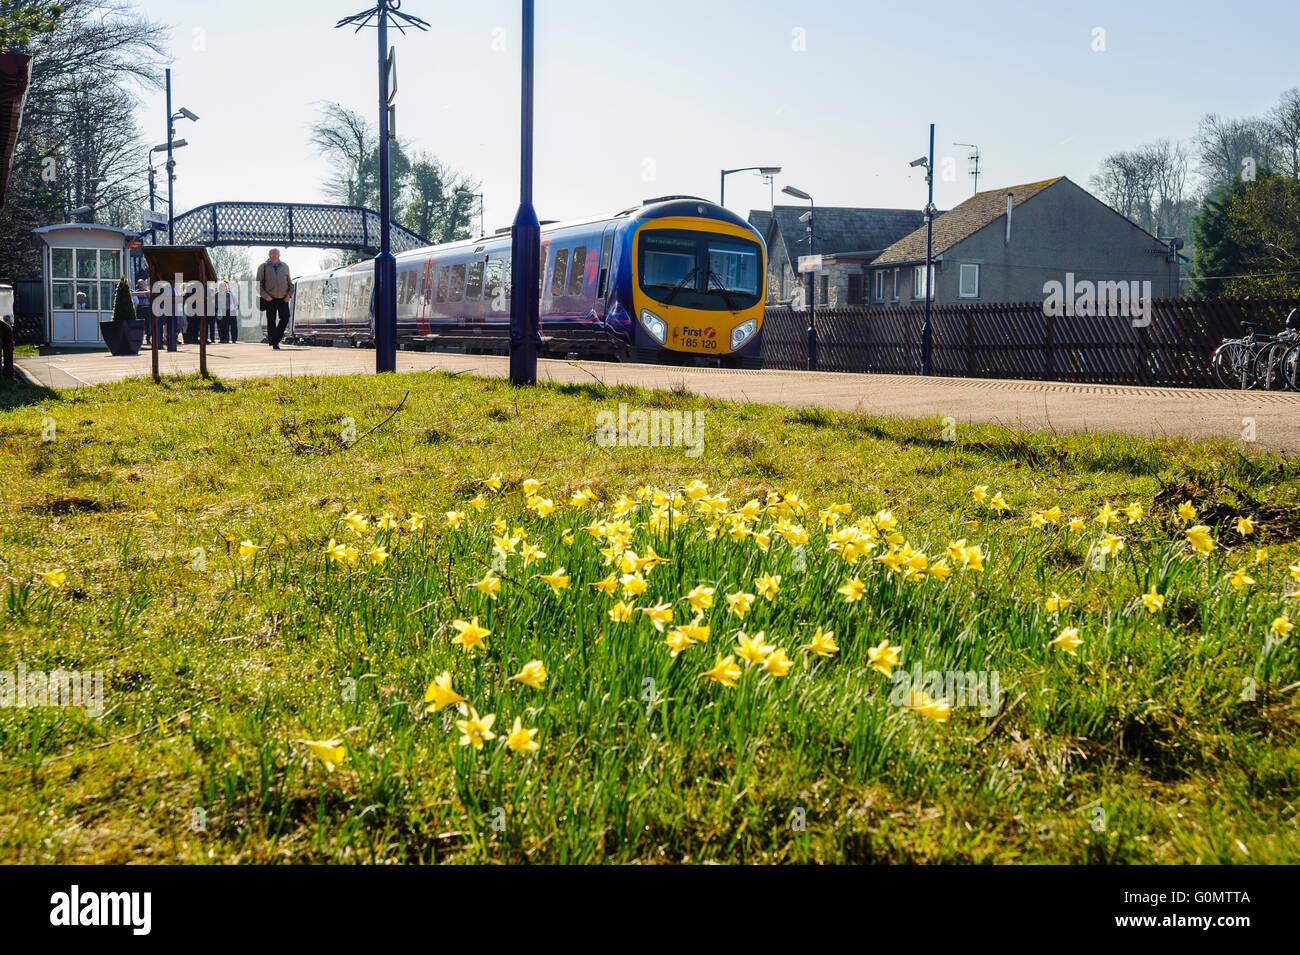 First TransPennine Express train at Arnside station Cumbria - Stock Image